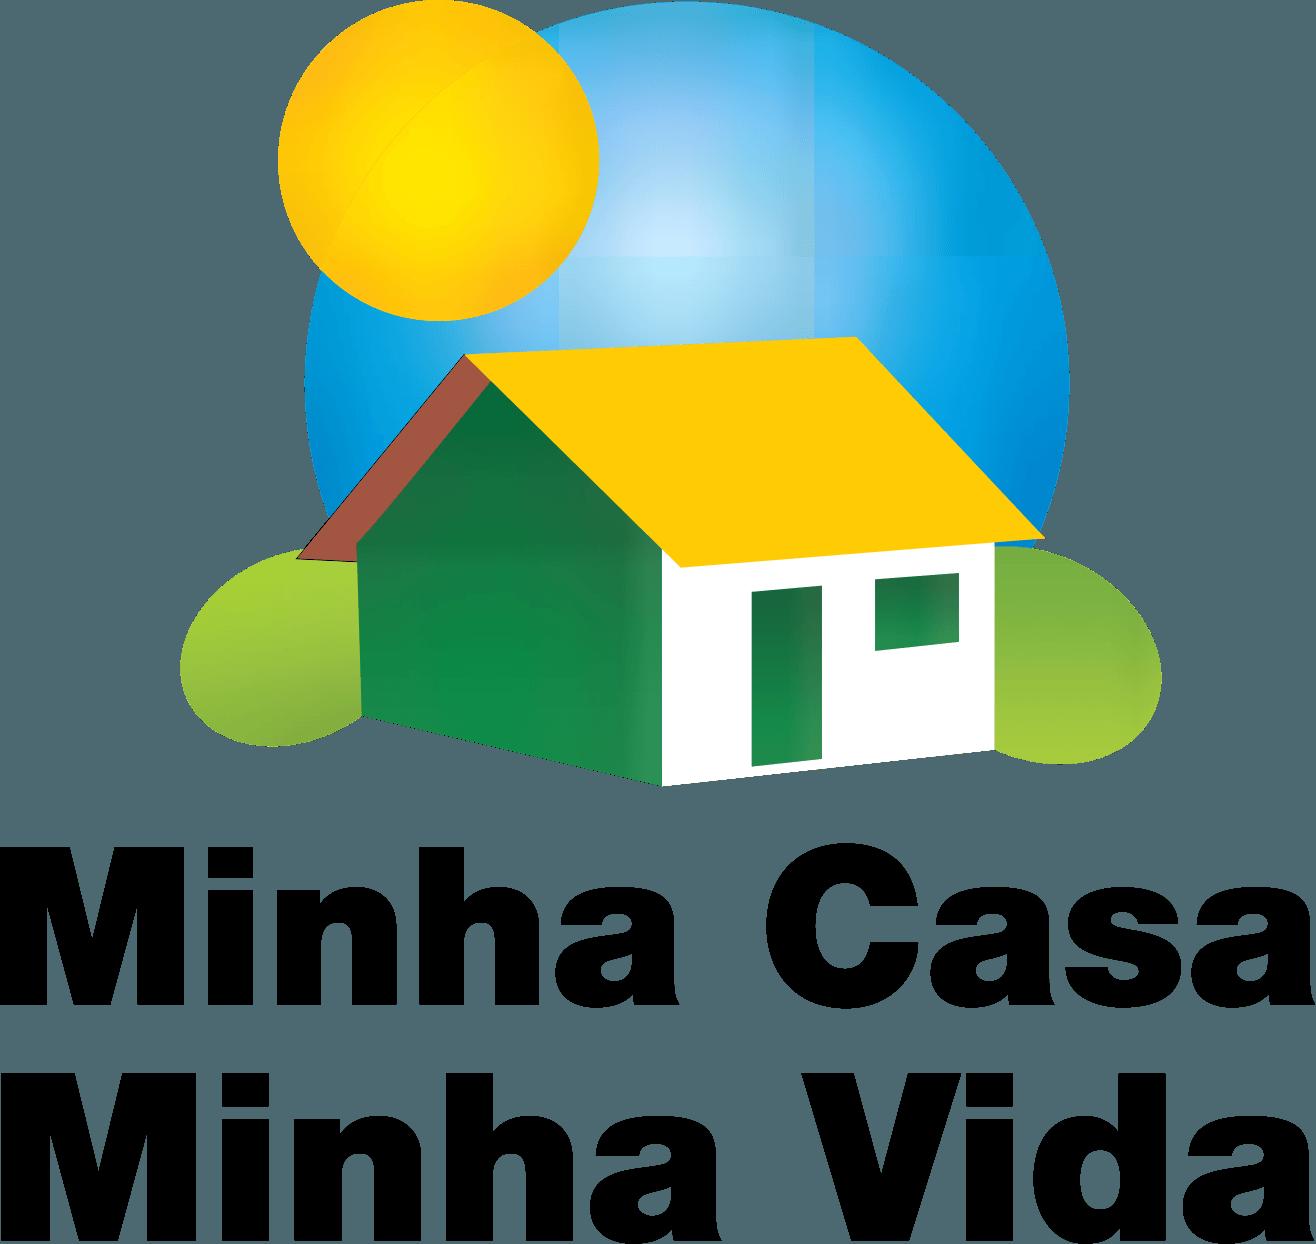 Internet Banda Larga no programa Minha Casa Minha Vida